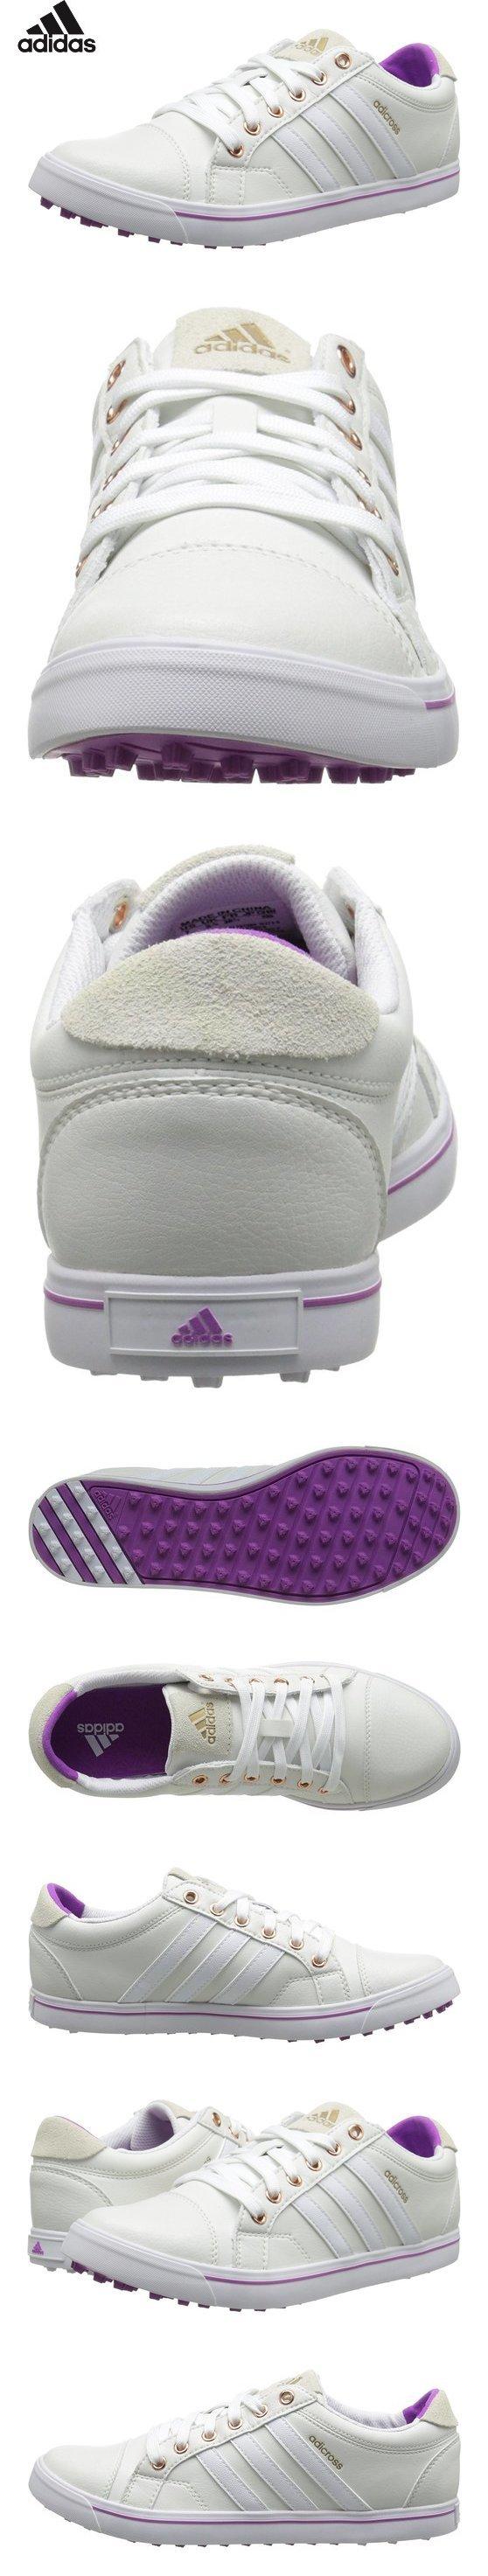 $84.99 - adidas Women's W Adicross IV Golf Shoe, FTW White/Clearonix, 8.5 M US